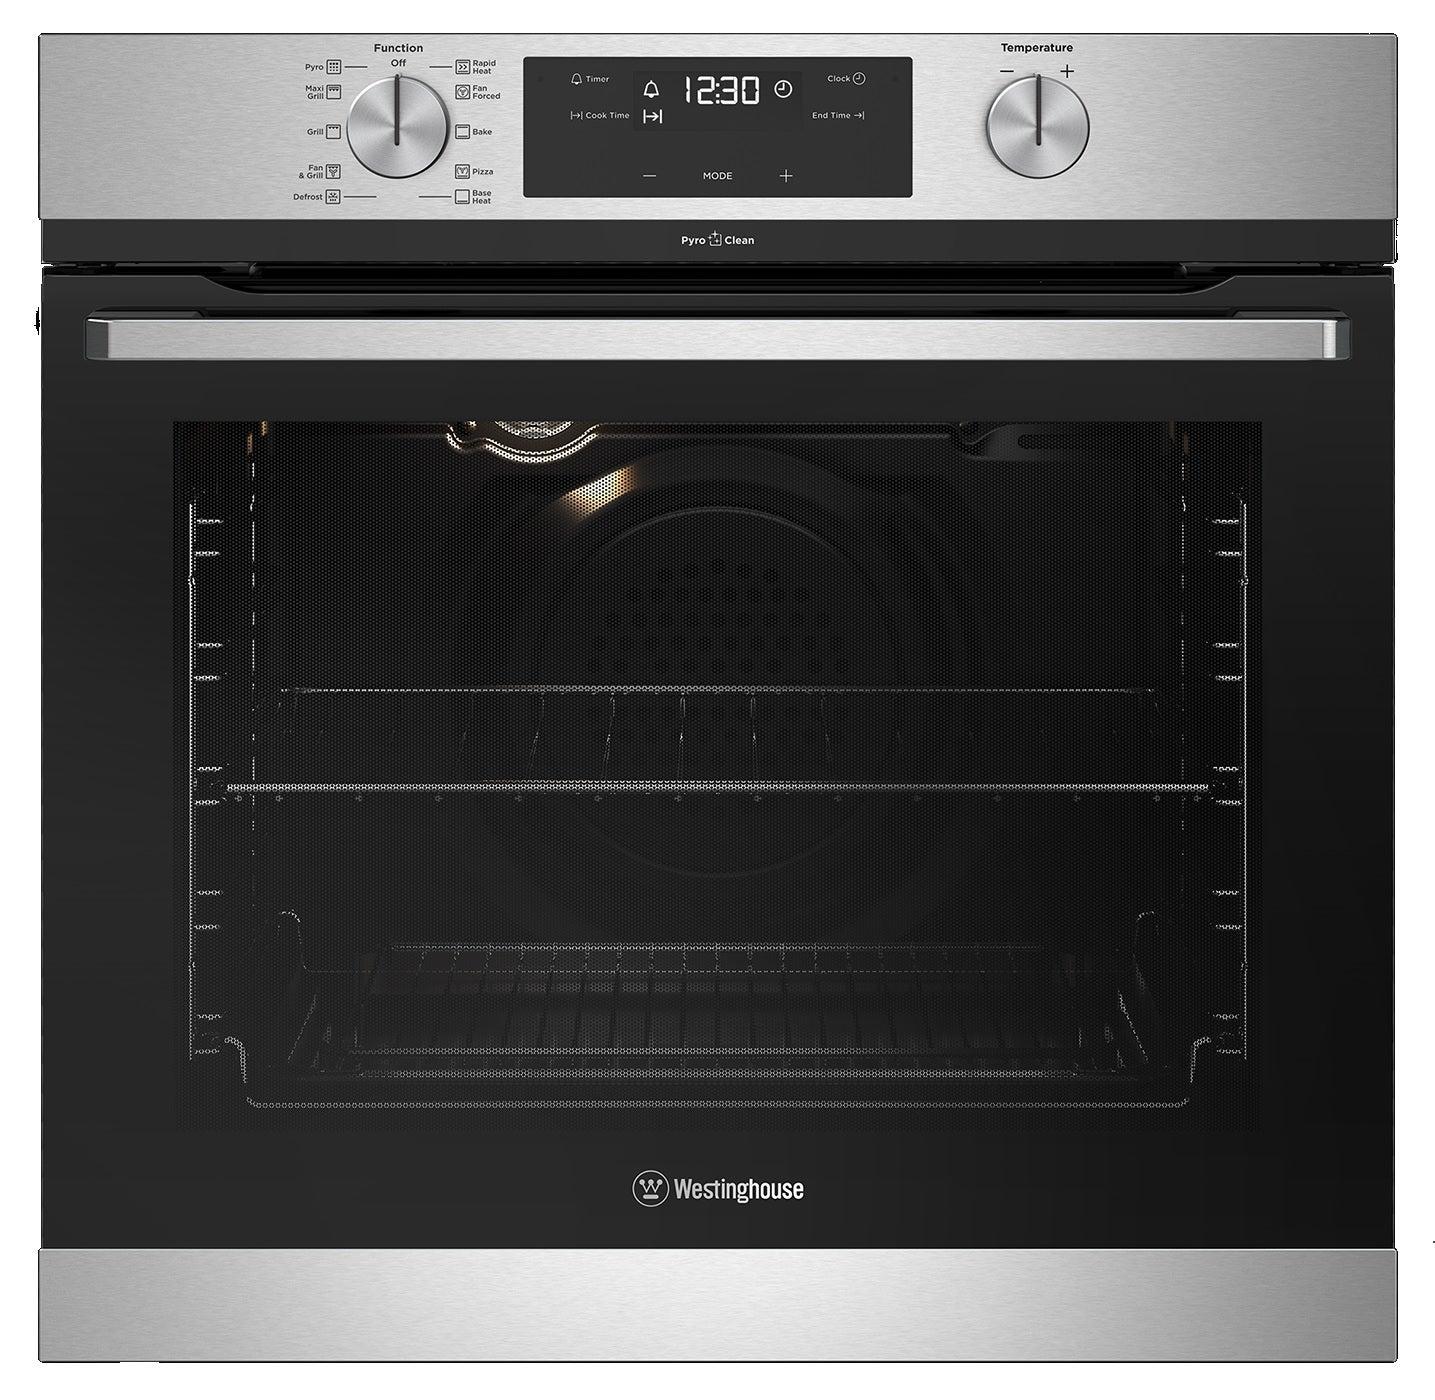 Westinghouse WVEP615SC Oven